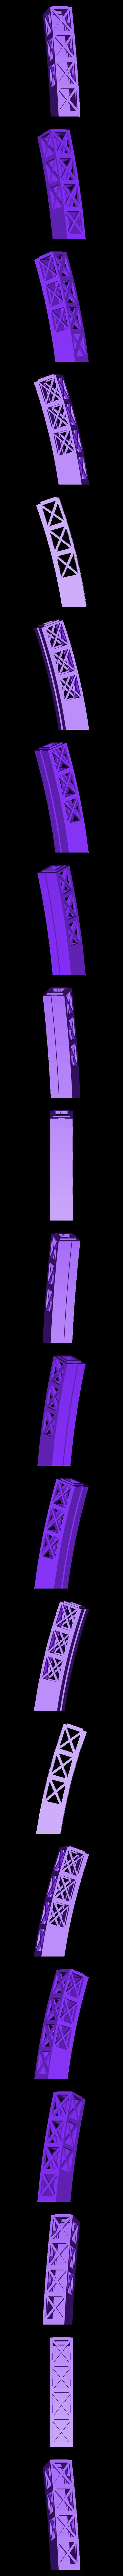 SEG_S-1.stl Download free STL file LED bridge lamp • Model to 3D print, Opossums